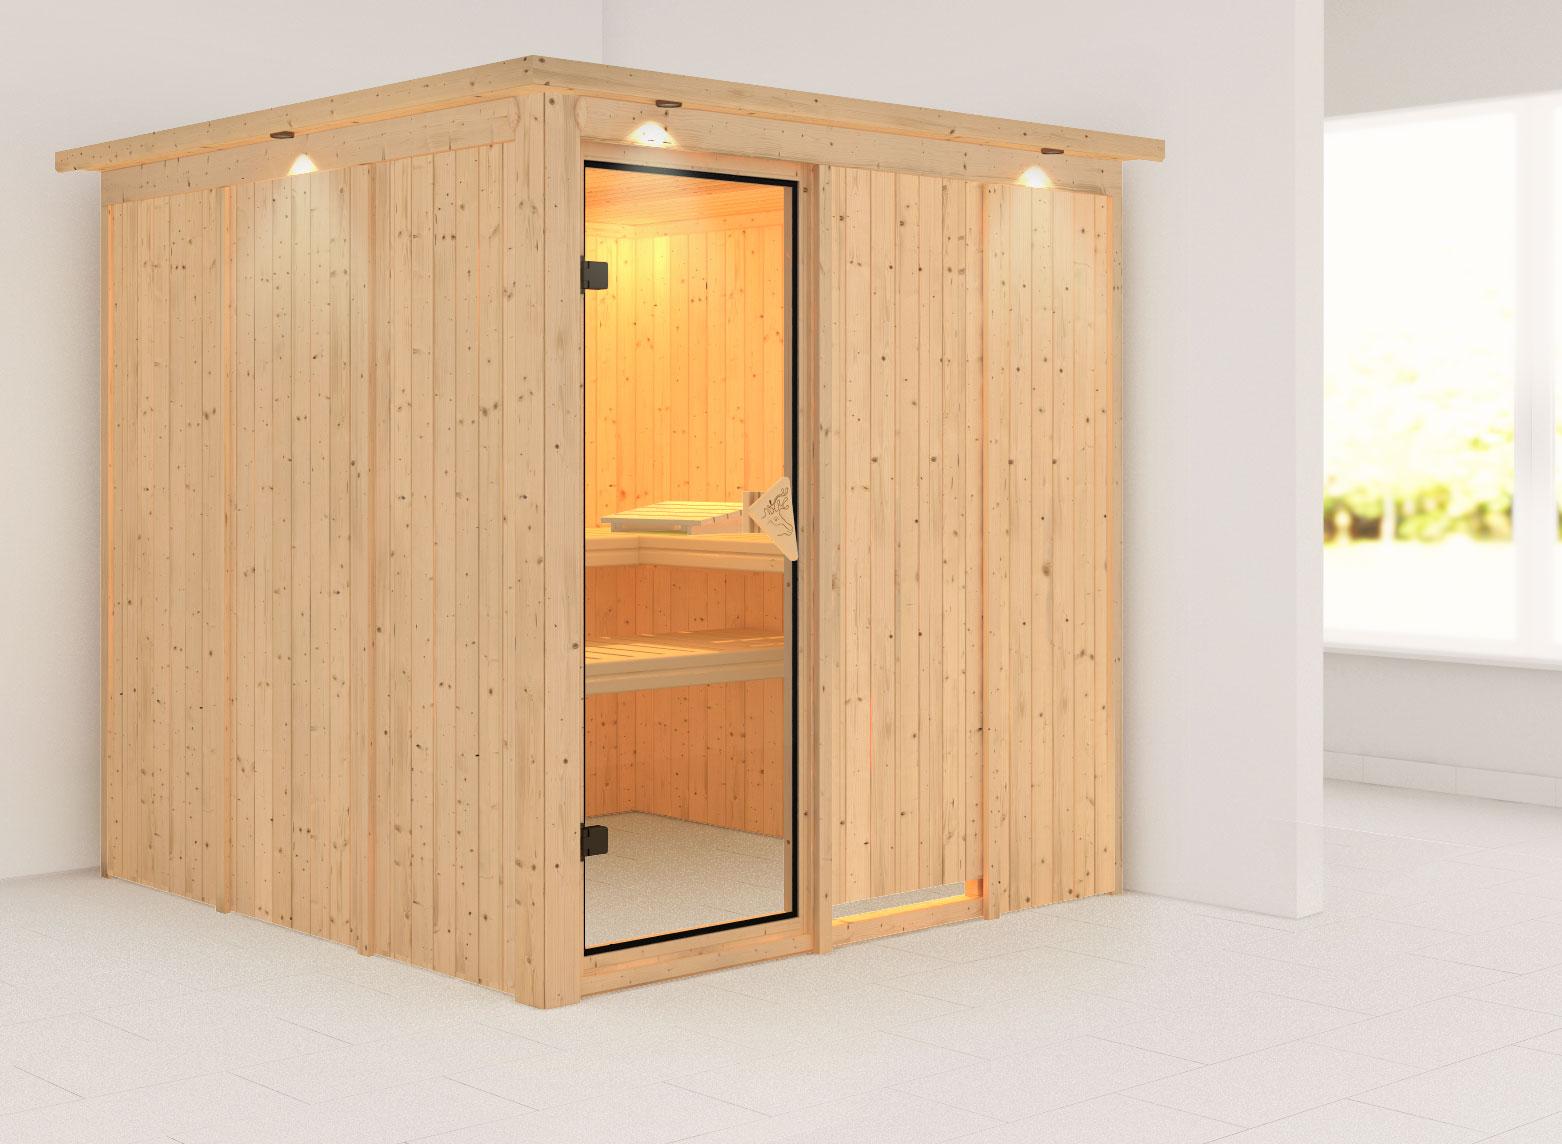 karibu sauna rodin 68mm dachkranz ohne ofen classic t r bei. Black Bedroom Furniture Sets. Home Design Ideas